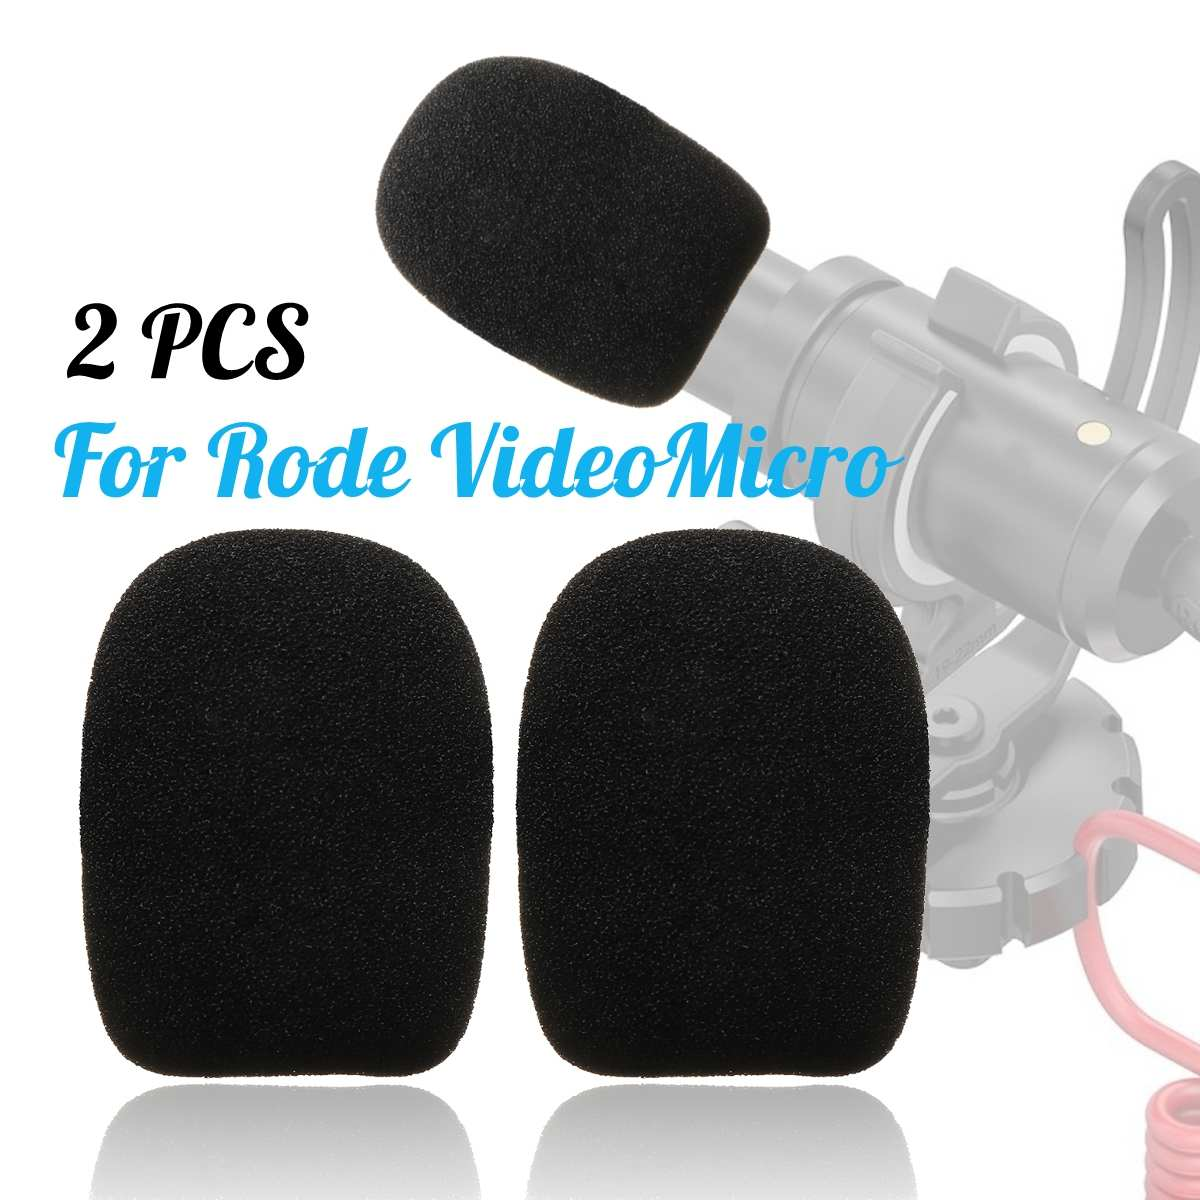 1 Paar Mikrofon Windschutzscheibe Schwamm Schaum Abdeckung Für Ritt Videomicro Audio Um Jeden Preis